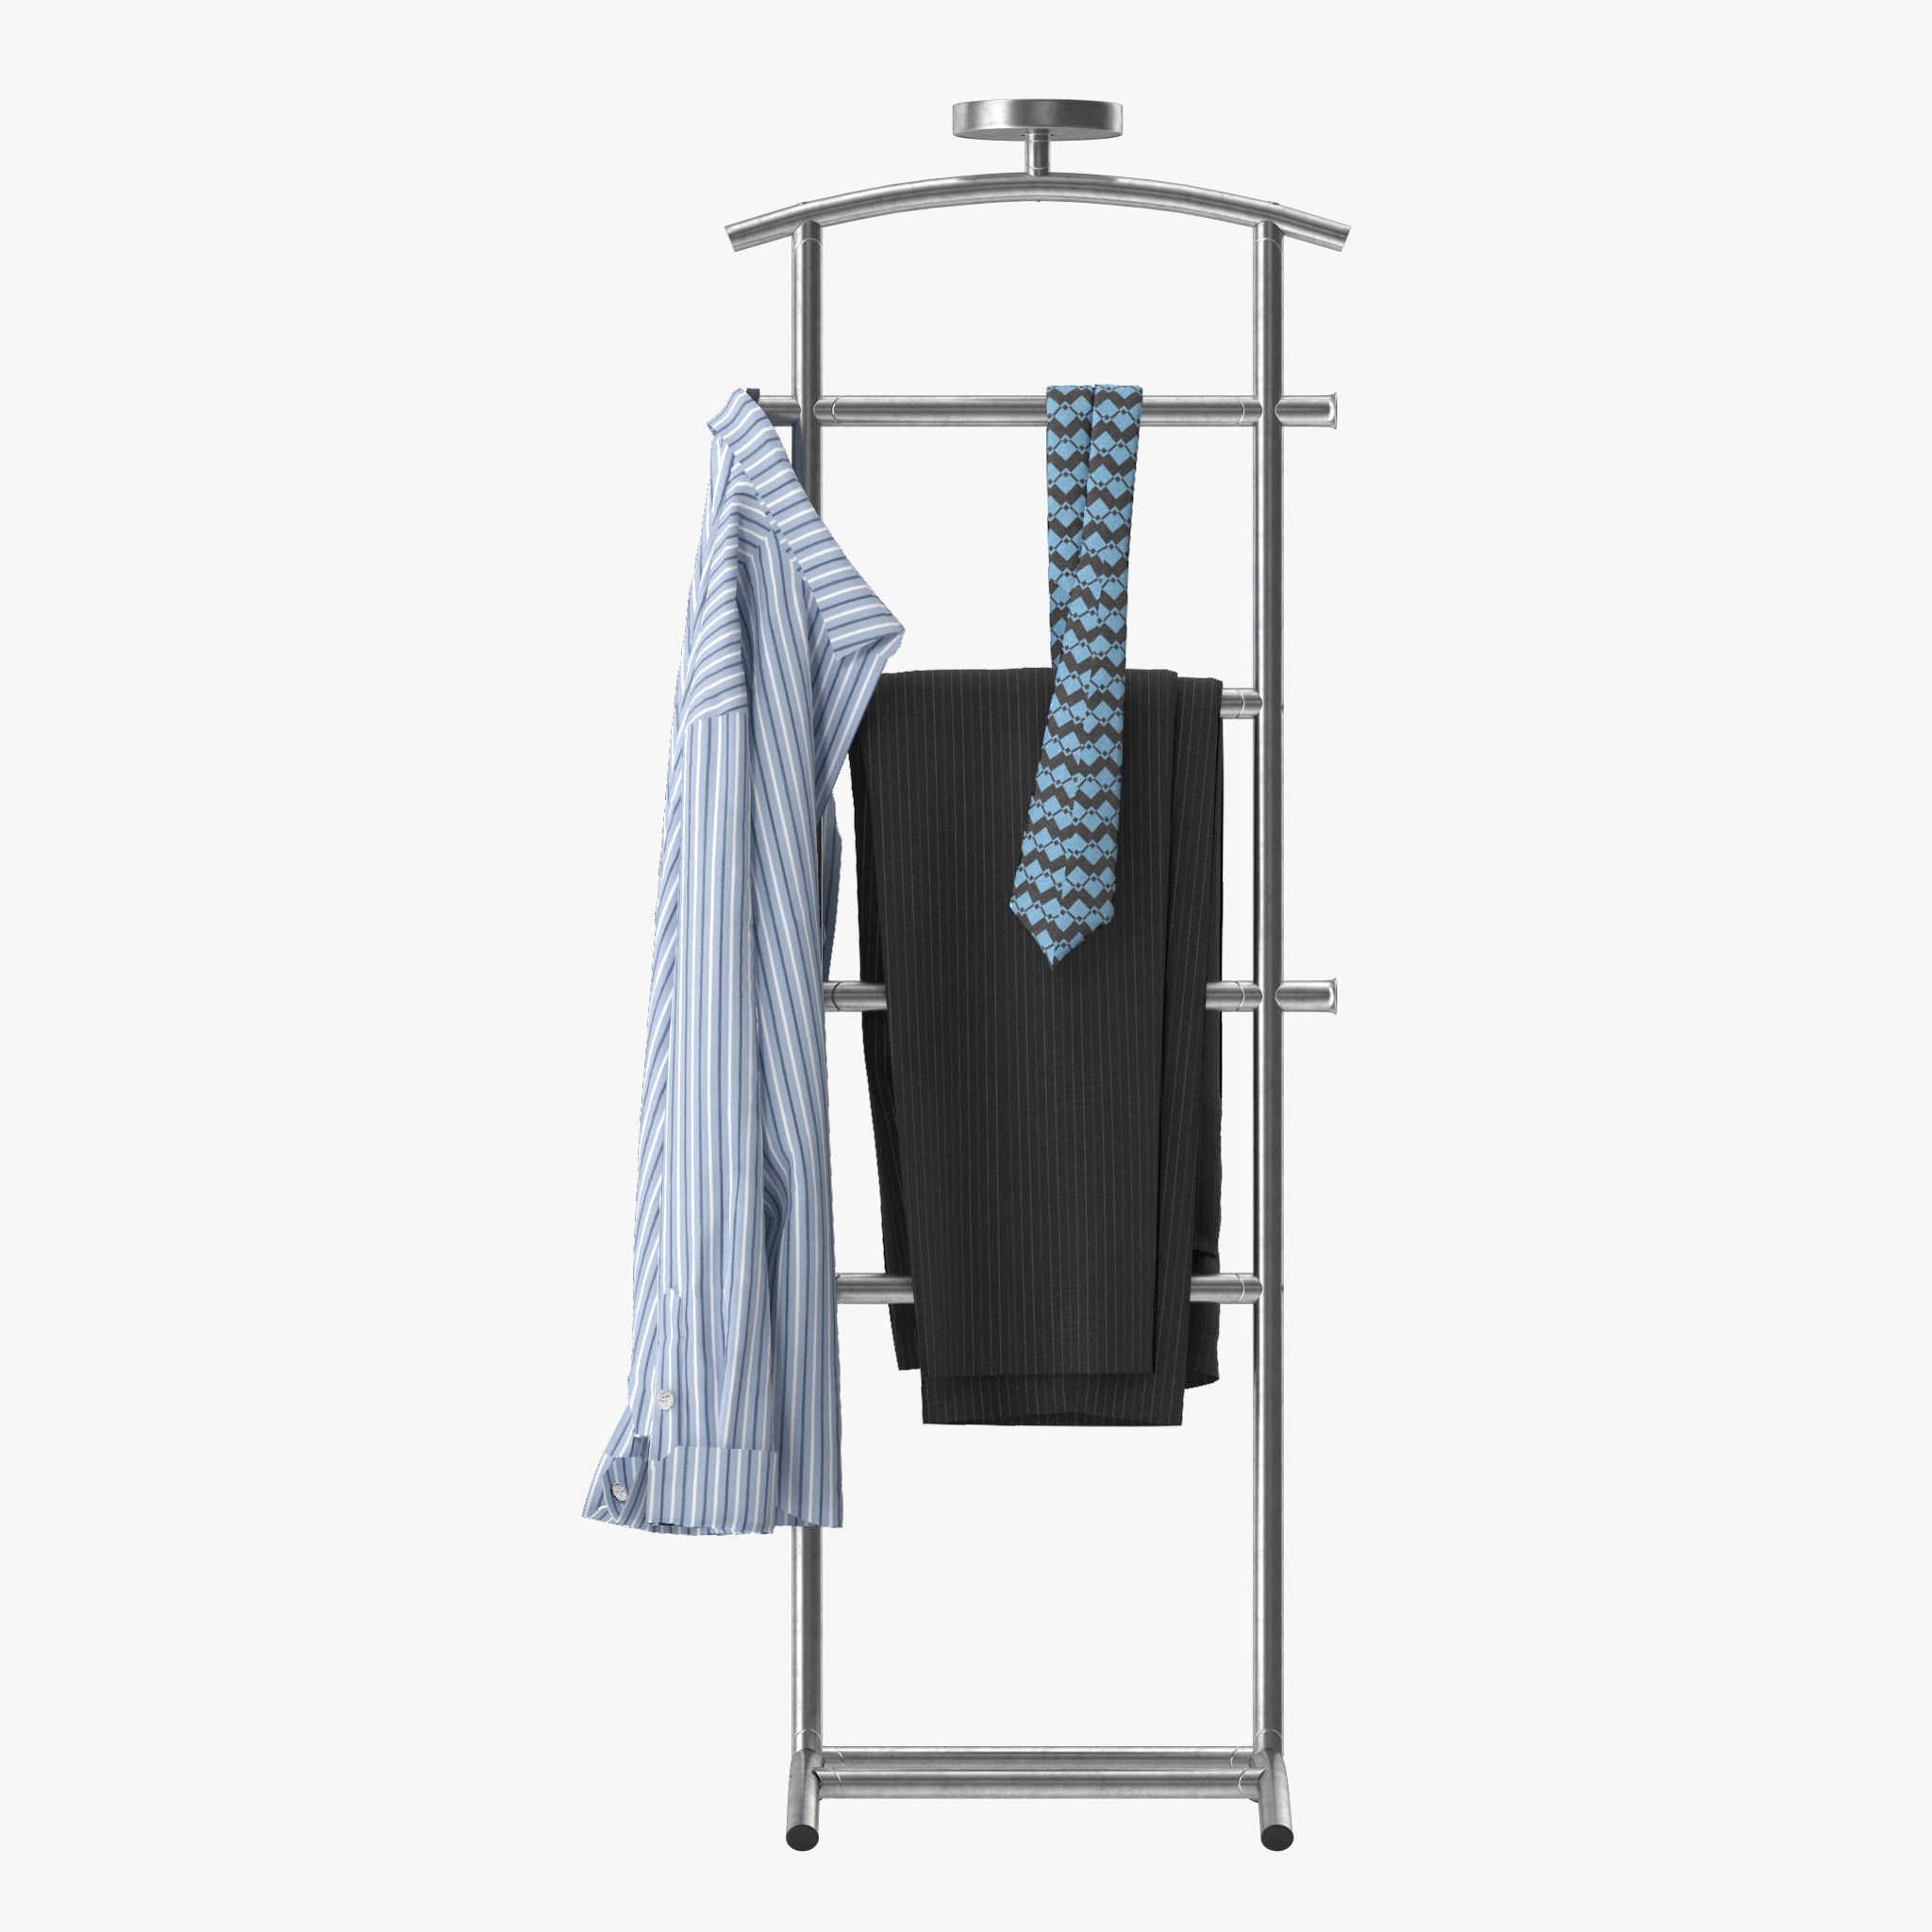 valet vetement ikea trendy cheap excellent related. Black Bedroom Furniture Sets. Home Design Ideas